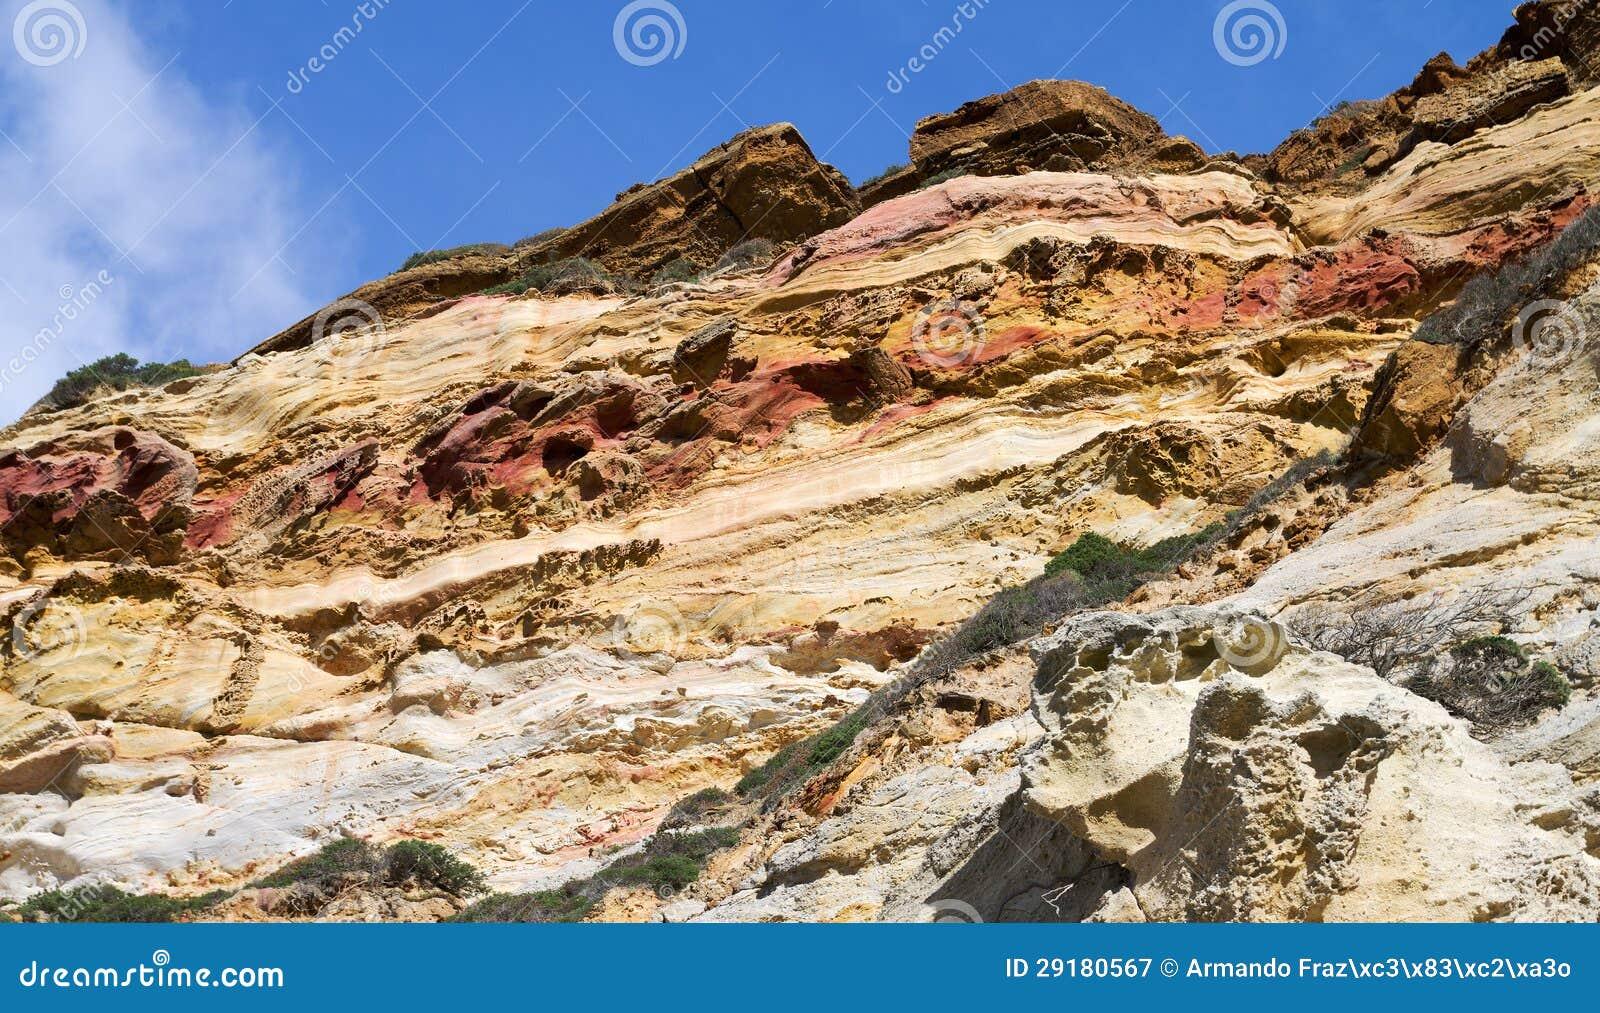 Sedimentary carbonate rocks